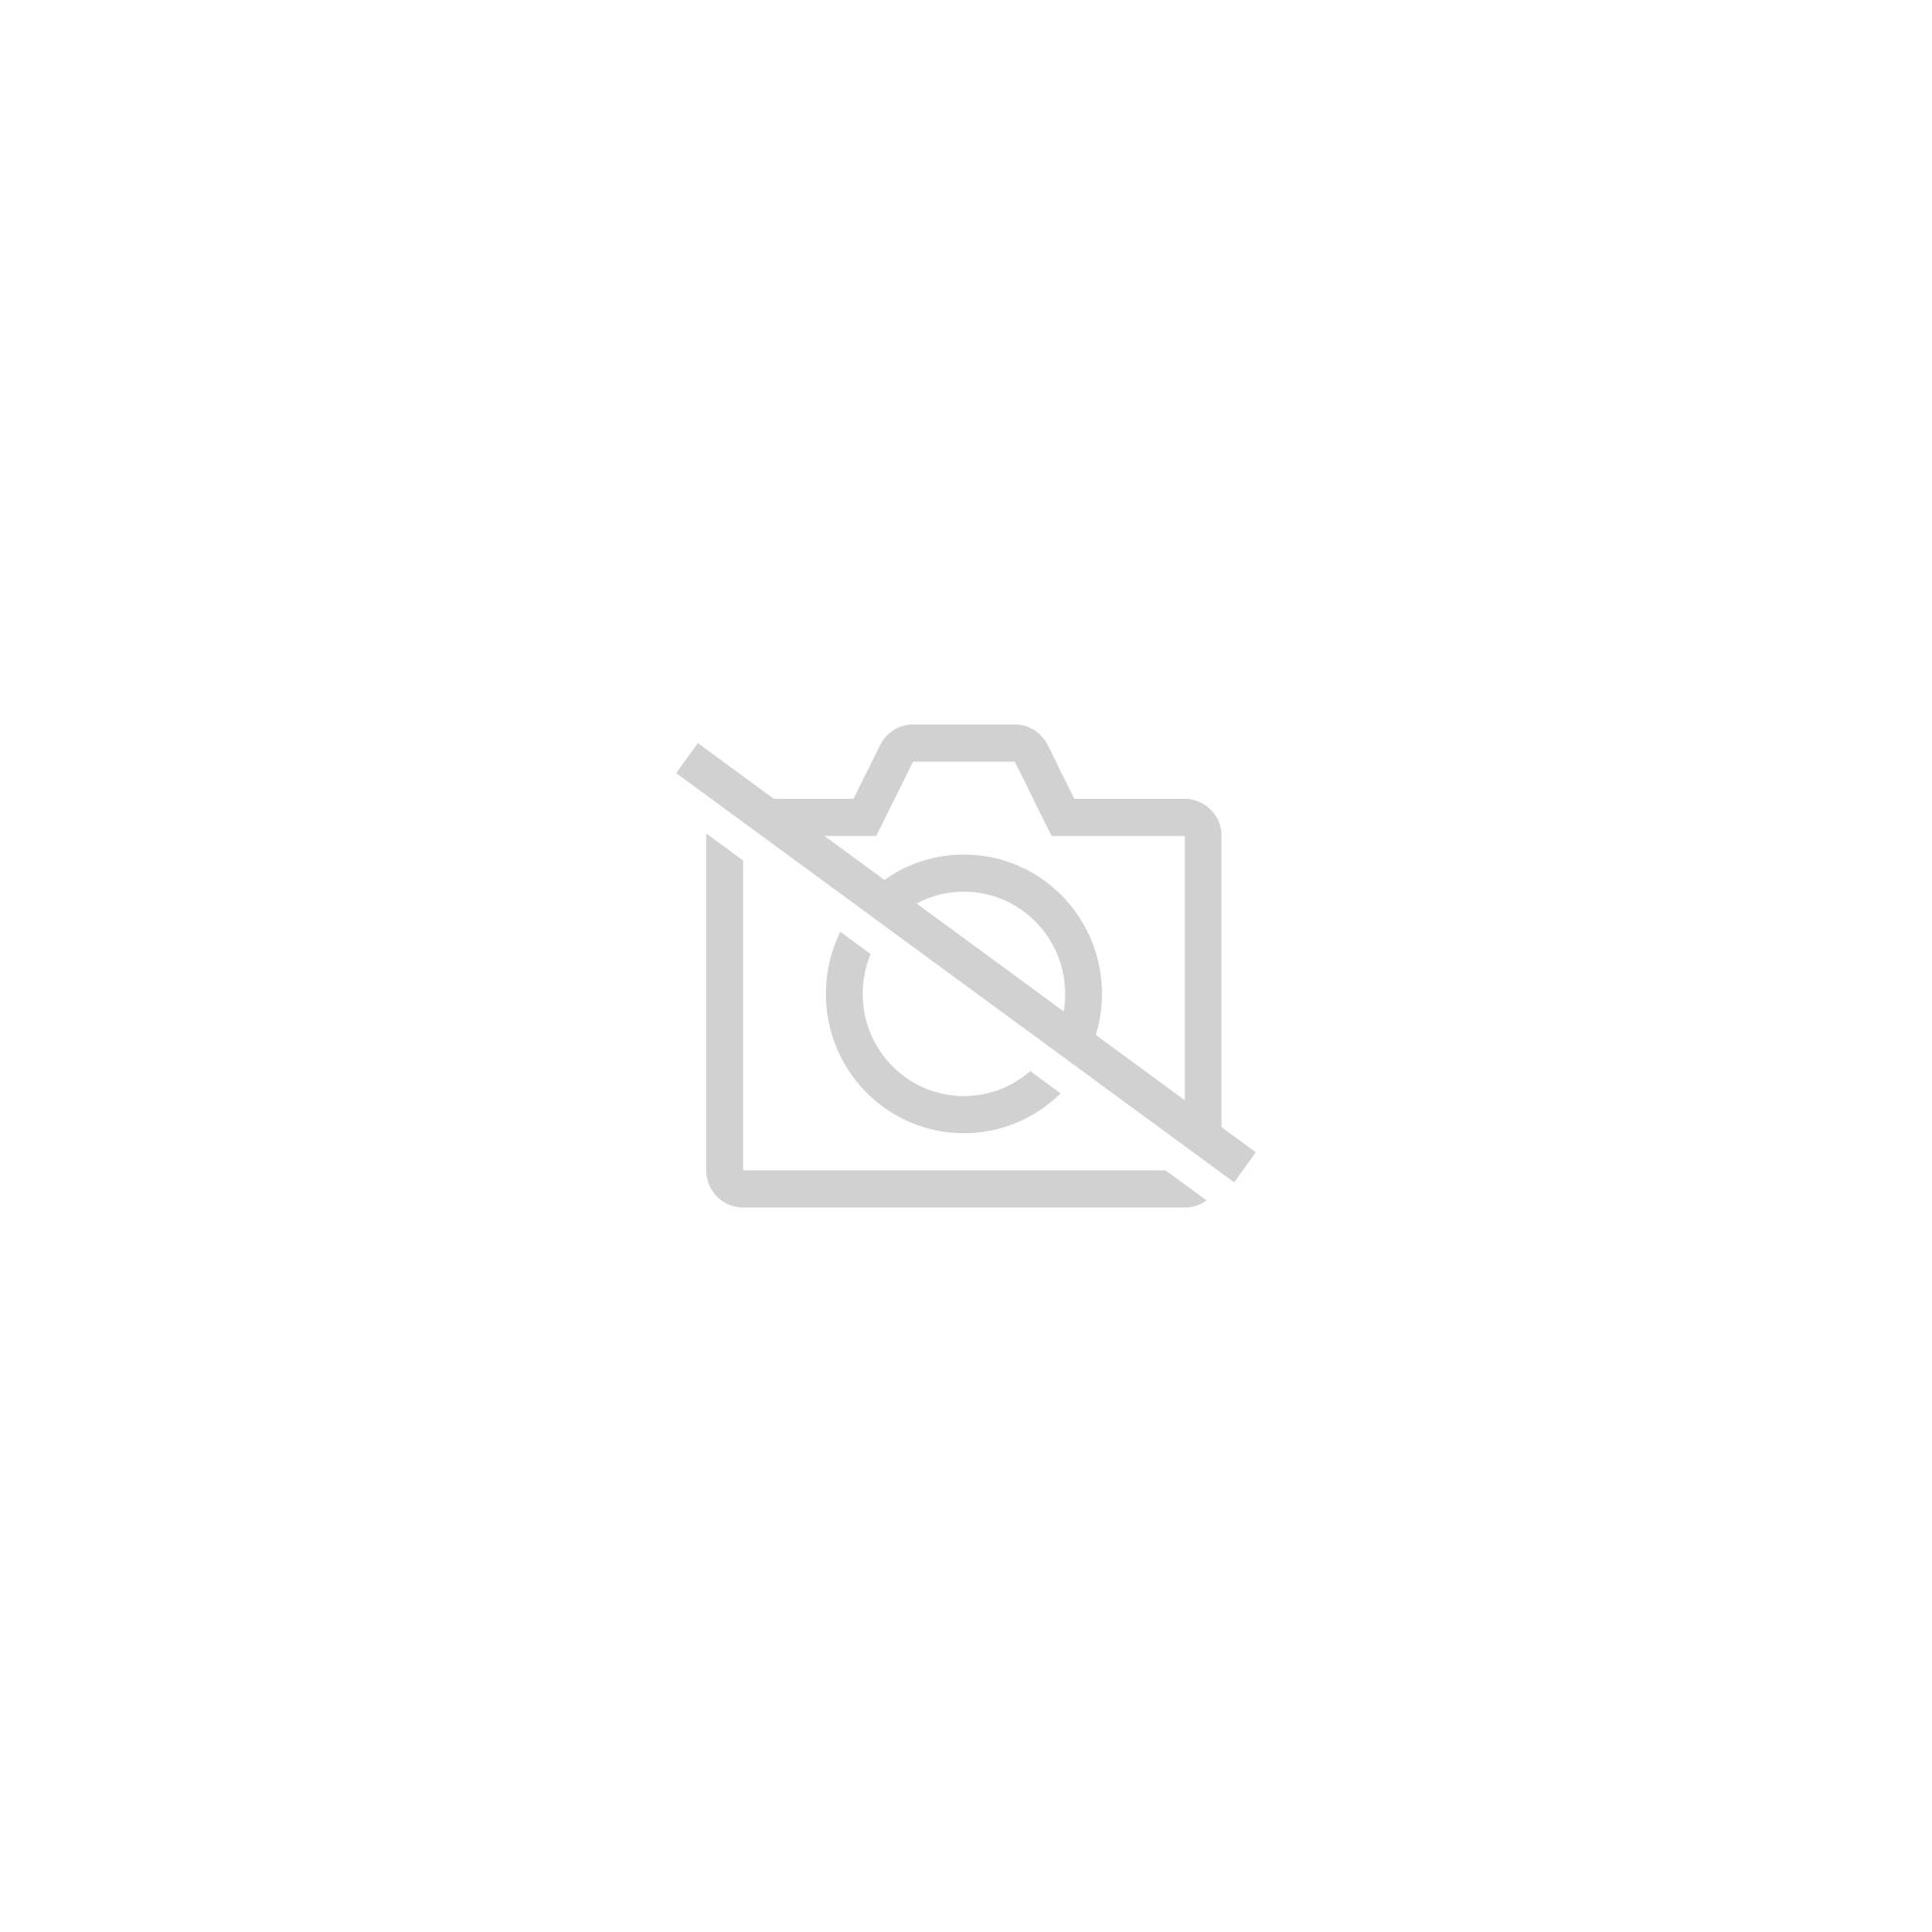 Coque pour Samsung Galaxy A50 Manga Naruto blanc taille unique